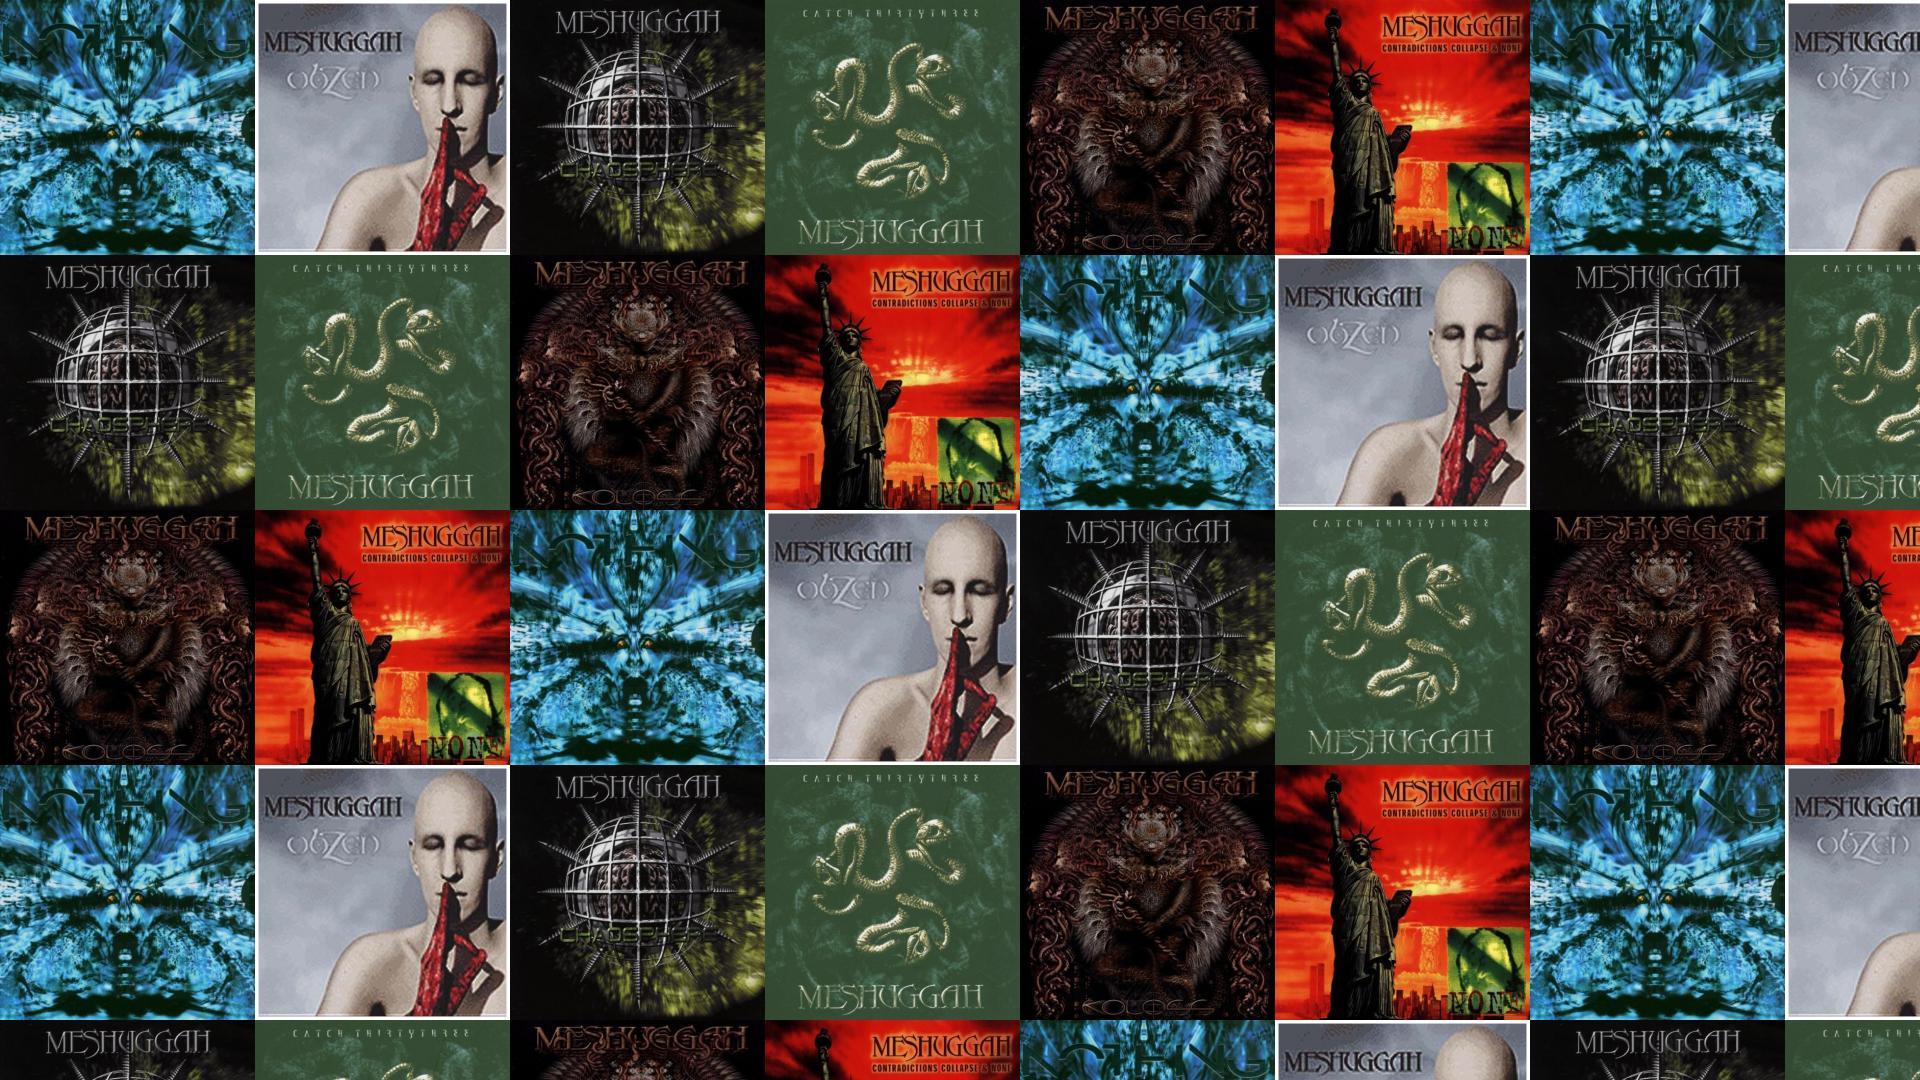 this wallpaper with images of Meshuggah Nothing Meshuggah 1920x1080